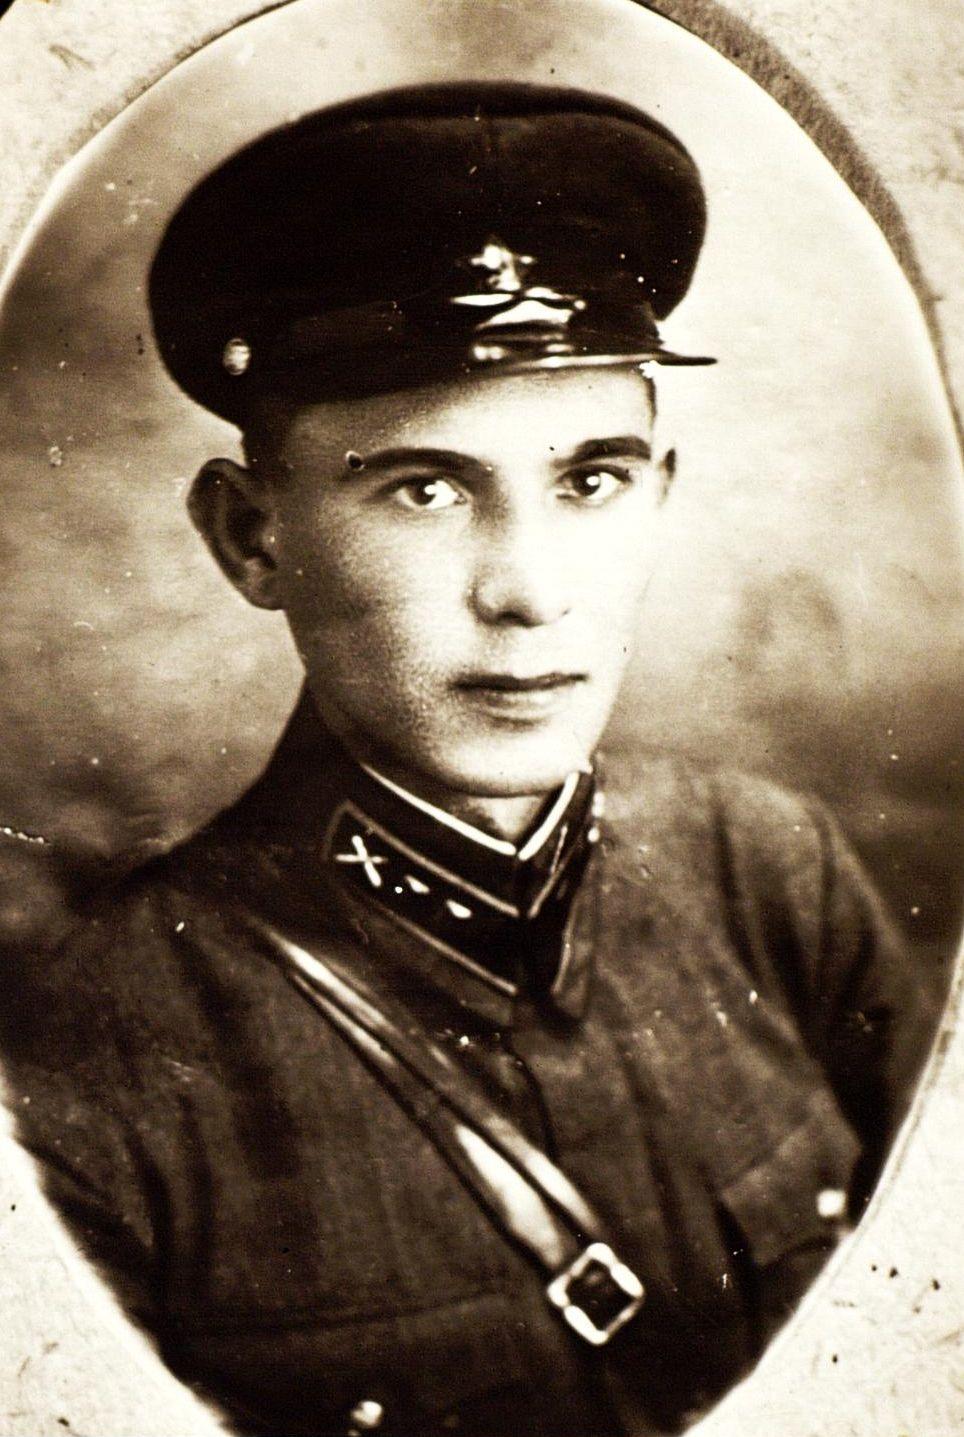 Фото. Герой Советского Союза А.М. Коваль. 1941  Ф8250 оп4 д7 л7 ©Tatfrontu.ru Photo Archive